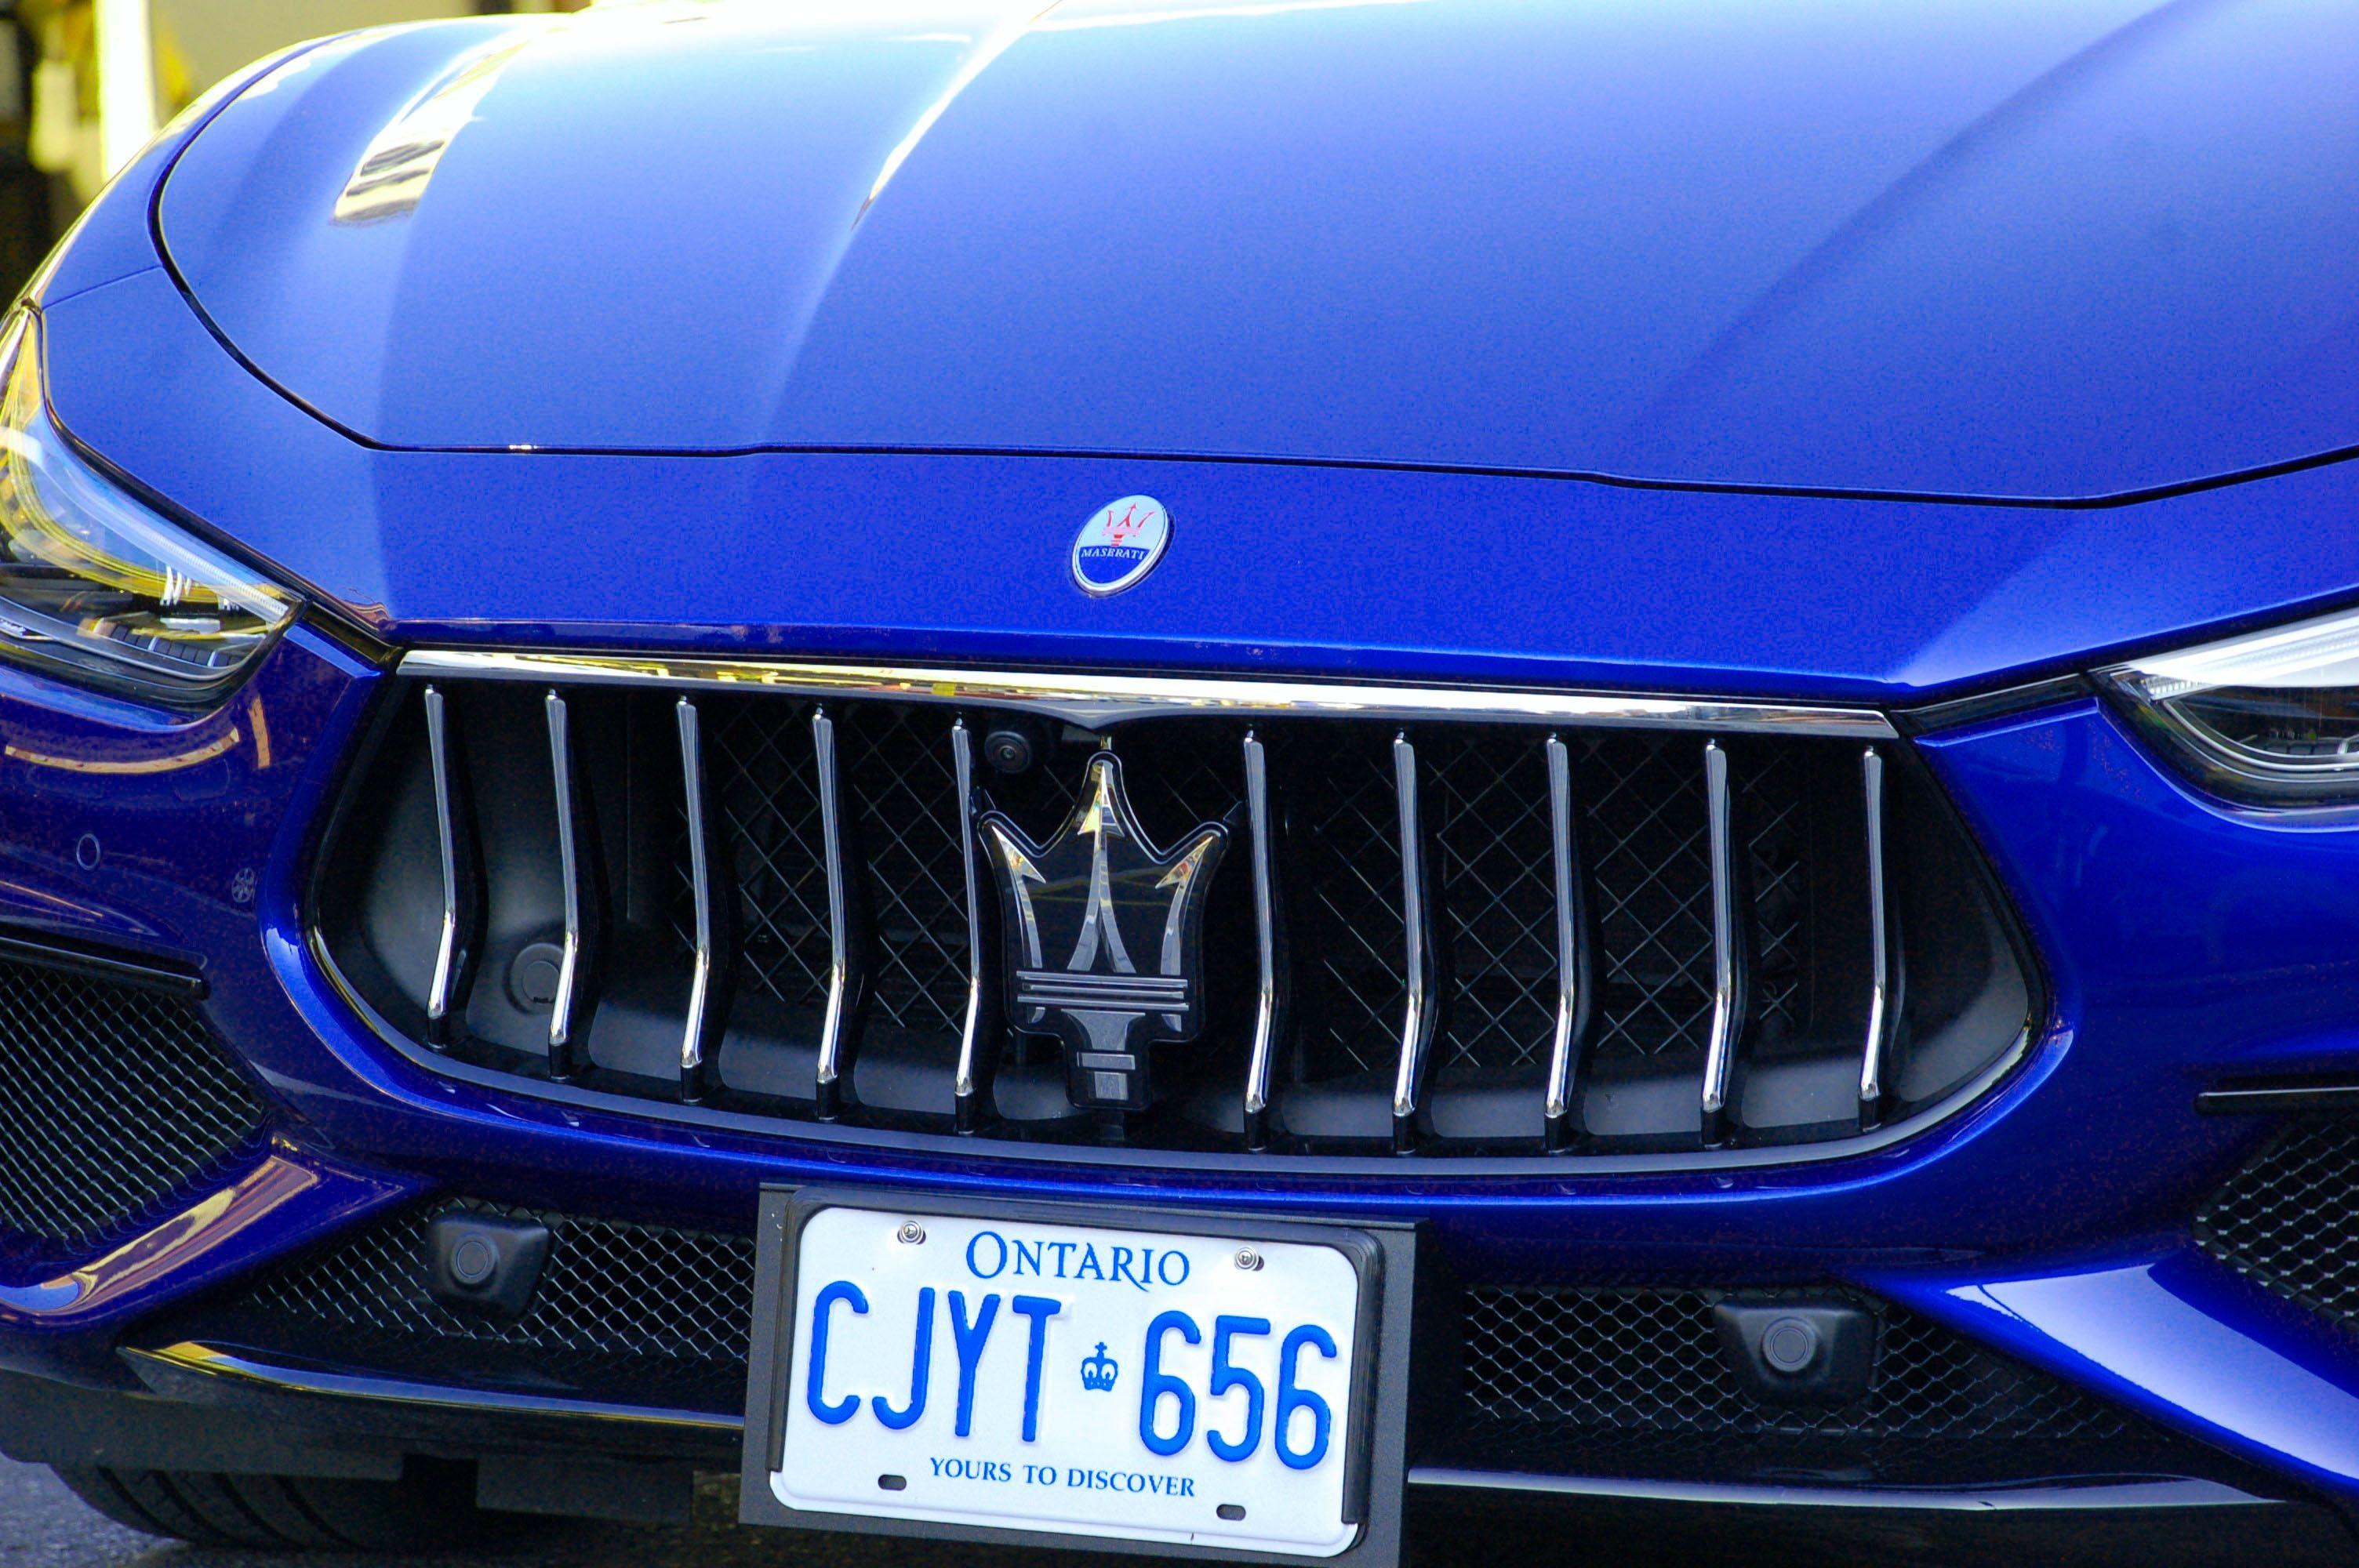 Blue Maserati vehicle Cars in 2020 Maserati, Vehicles